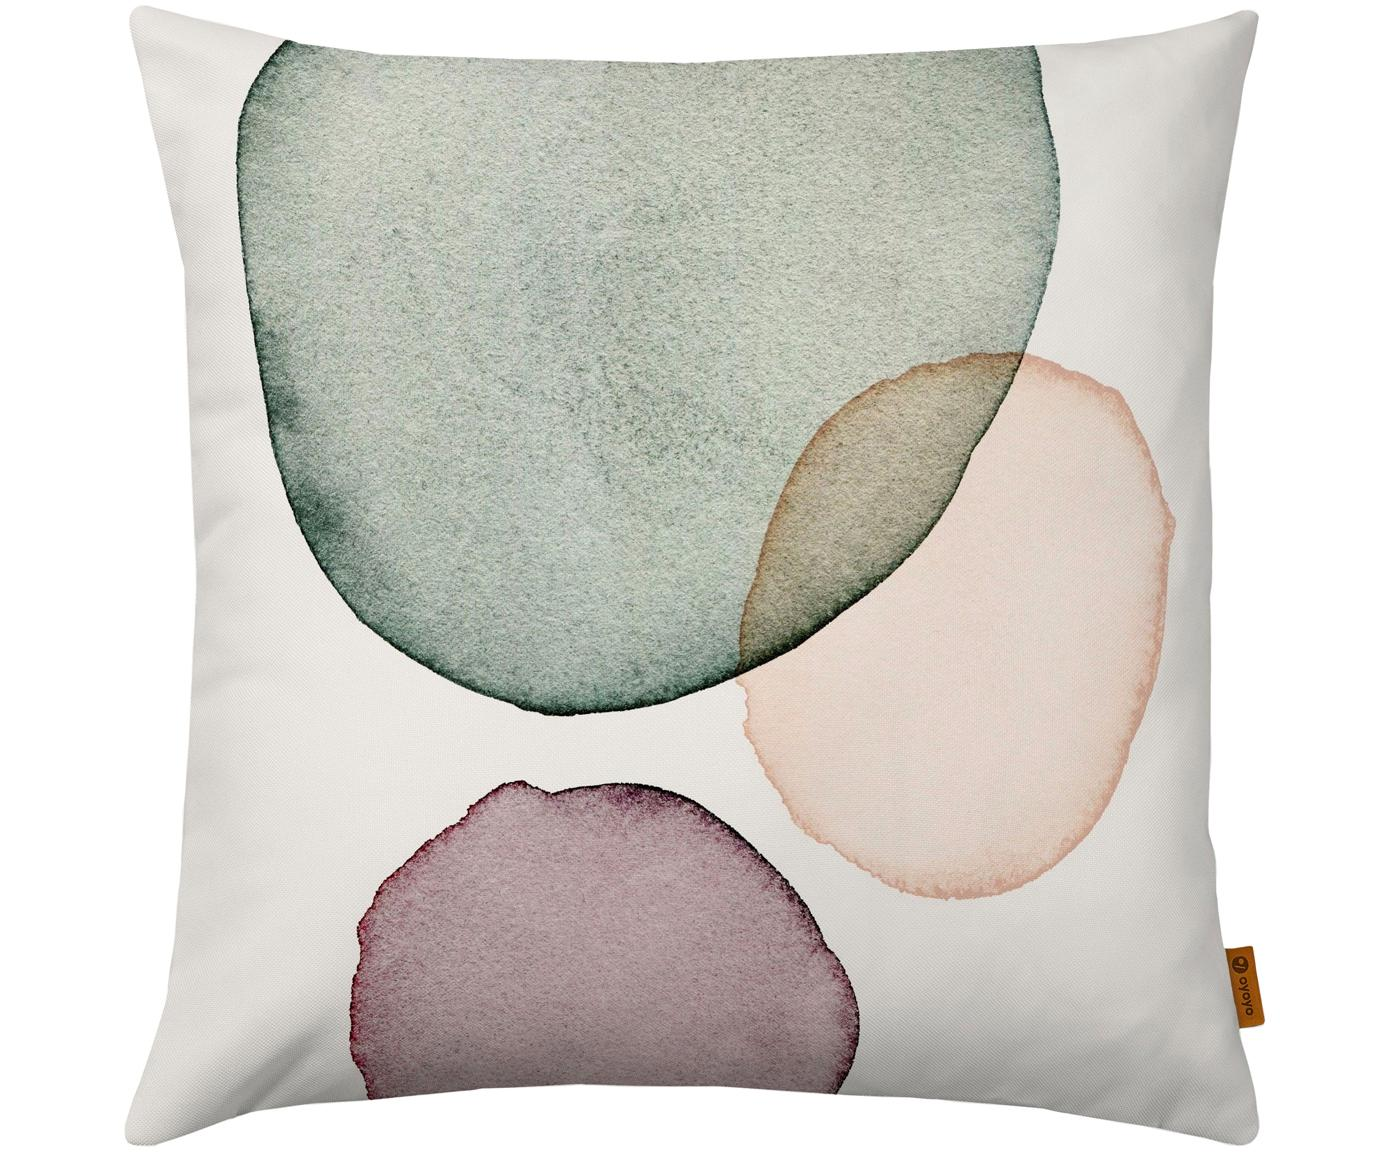 Kissenhülle Calm mit geometrischem Print in Aquarelloptik, 100% Polyester, Weiss, Grün, Lila, Lachsfarben, 50 x 50 cm